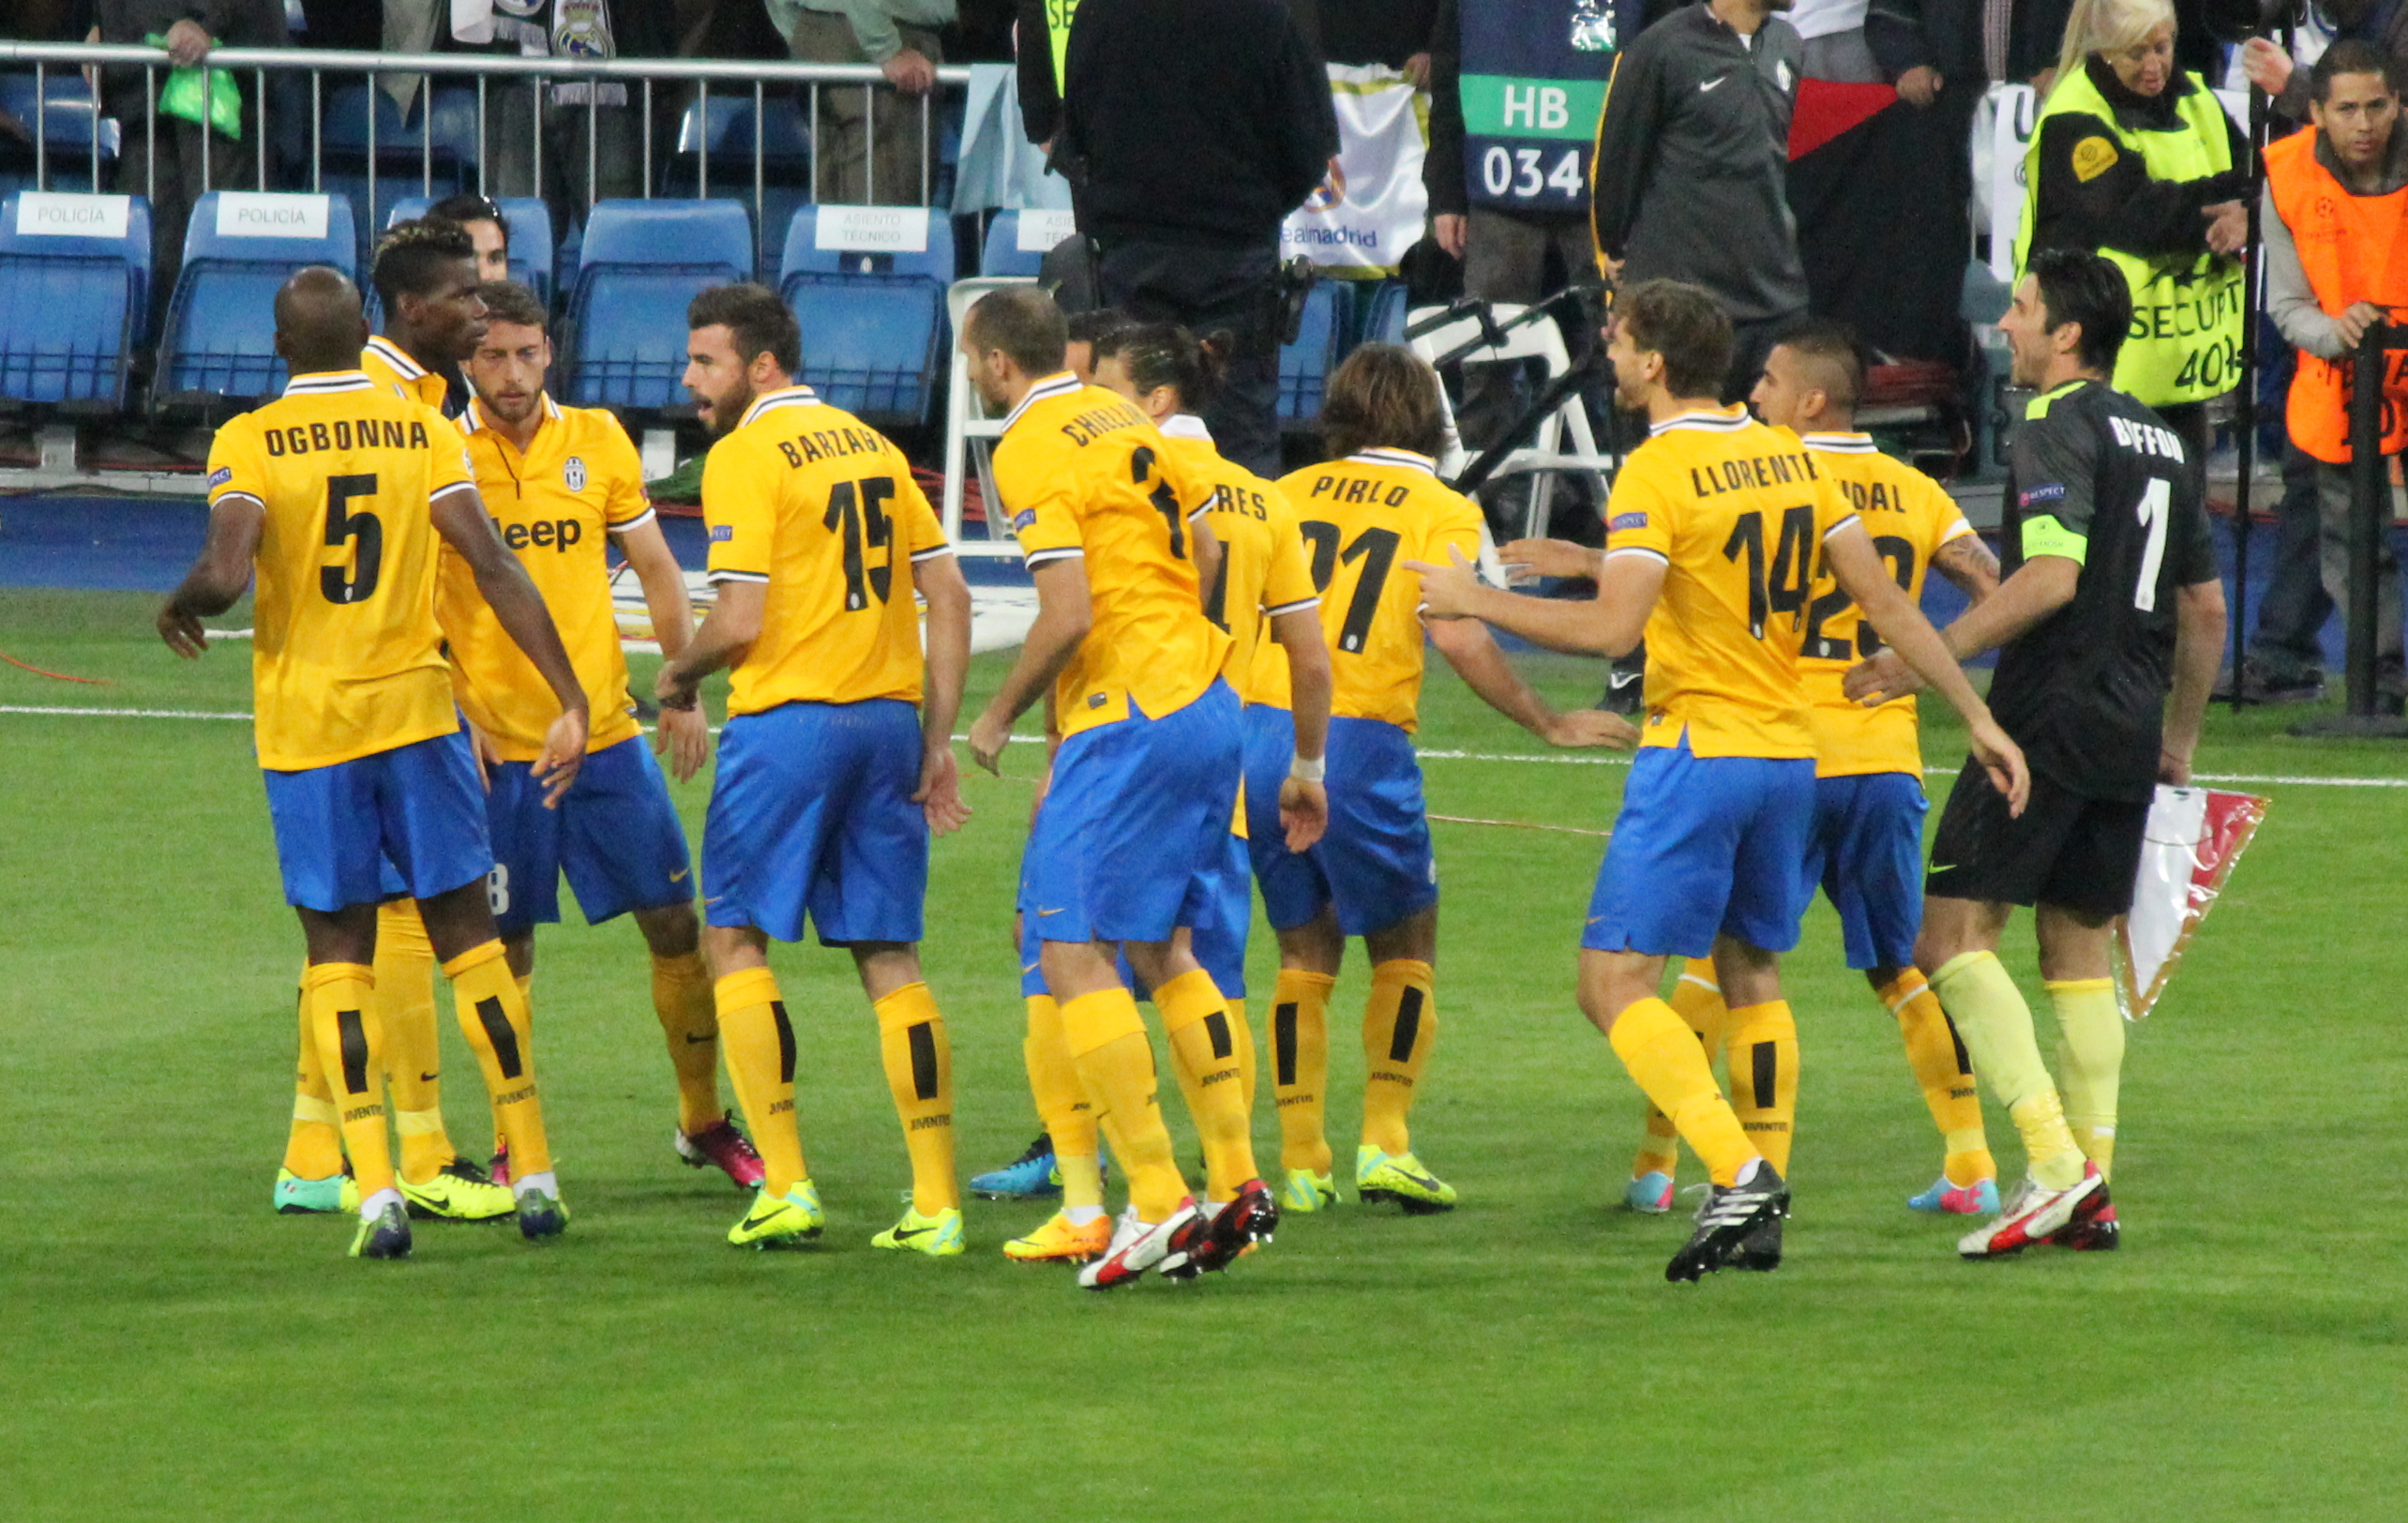 Image Result For En Vivo Juventus Vs Real Madrid En Vivo Live Stream